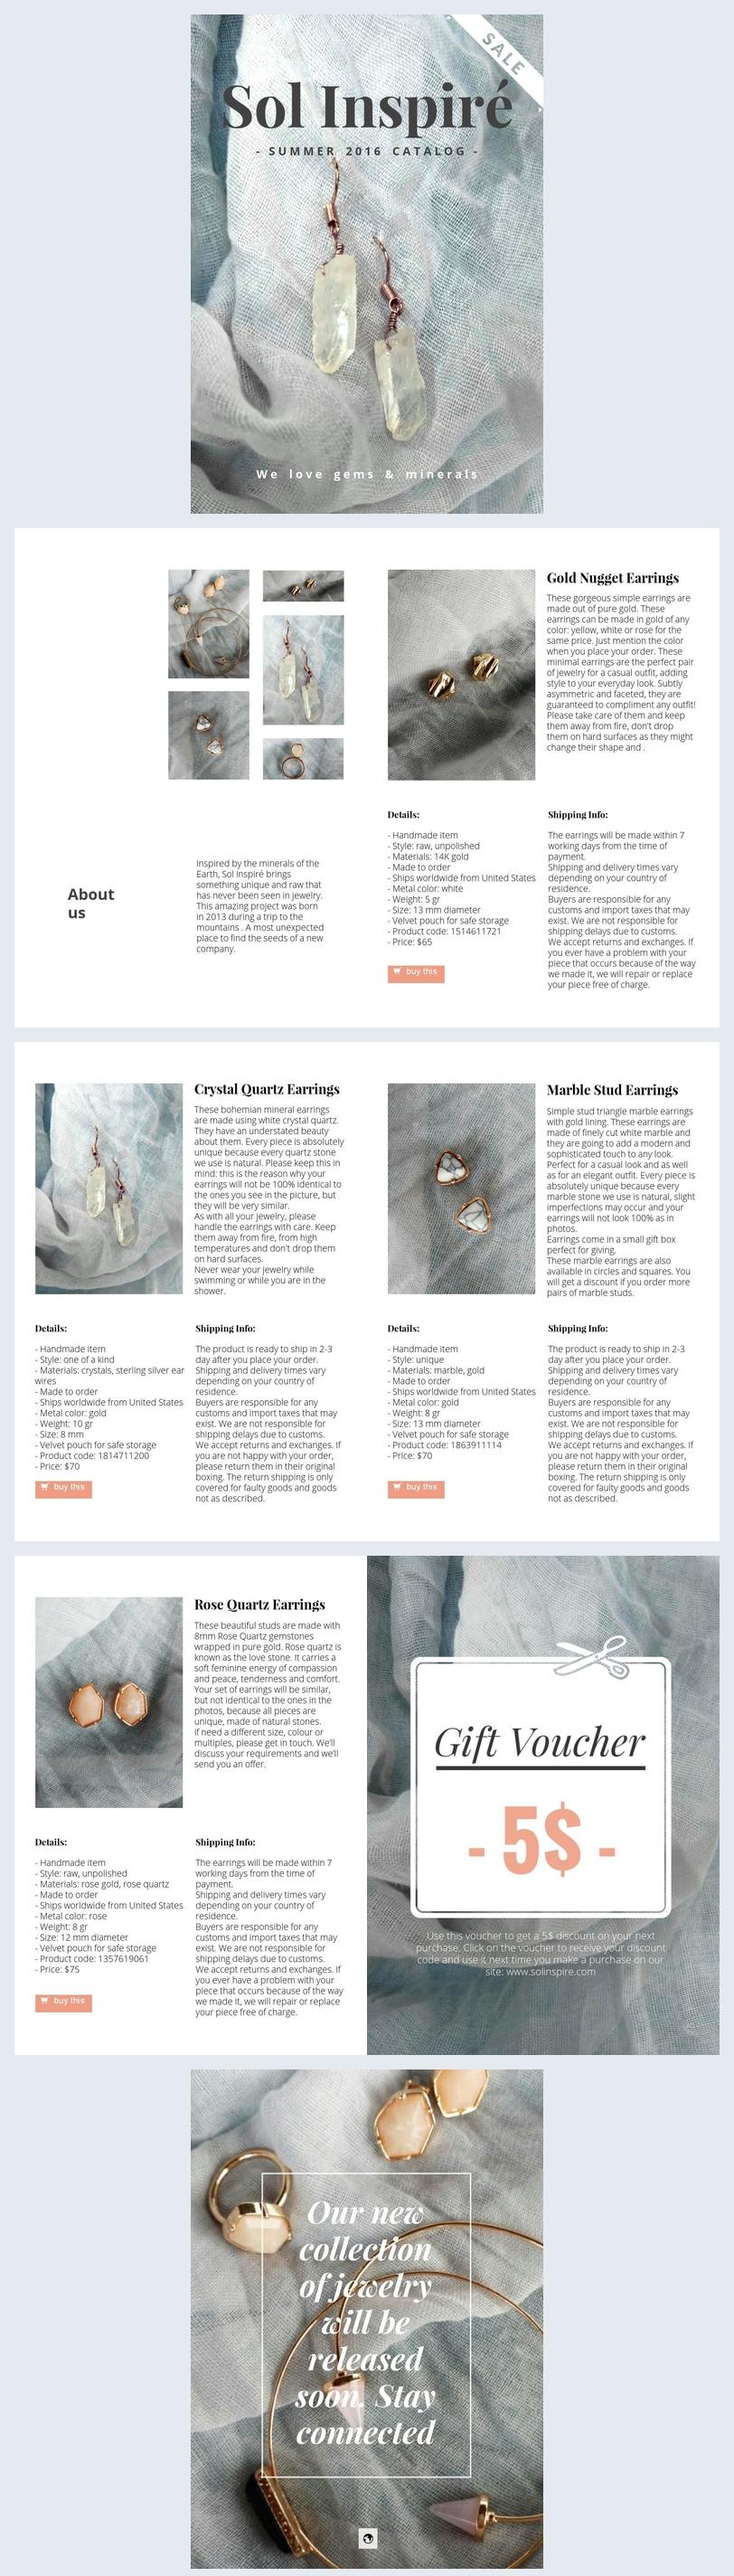 Design für Accessoires-Katalog